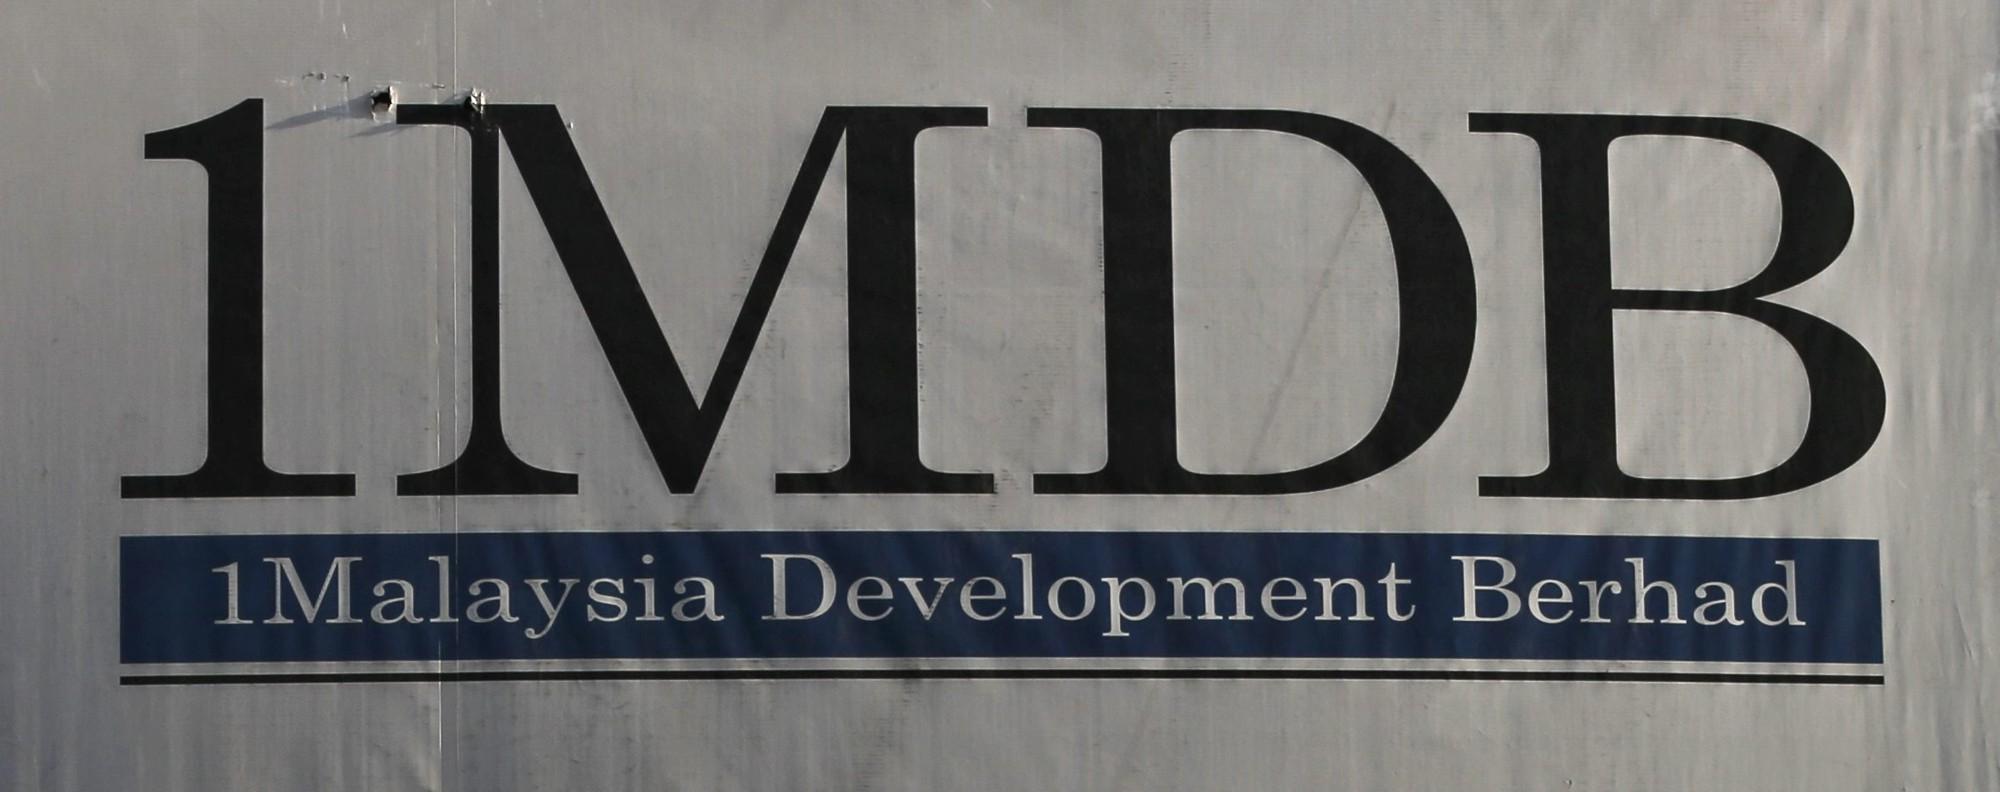 A billboard for 1Malaysia Development Berhad (1MDB). Photo: EPA